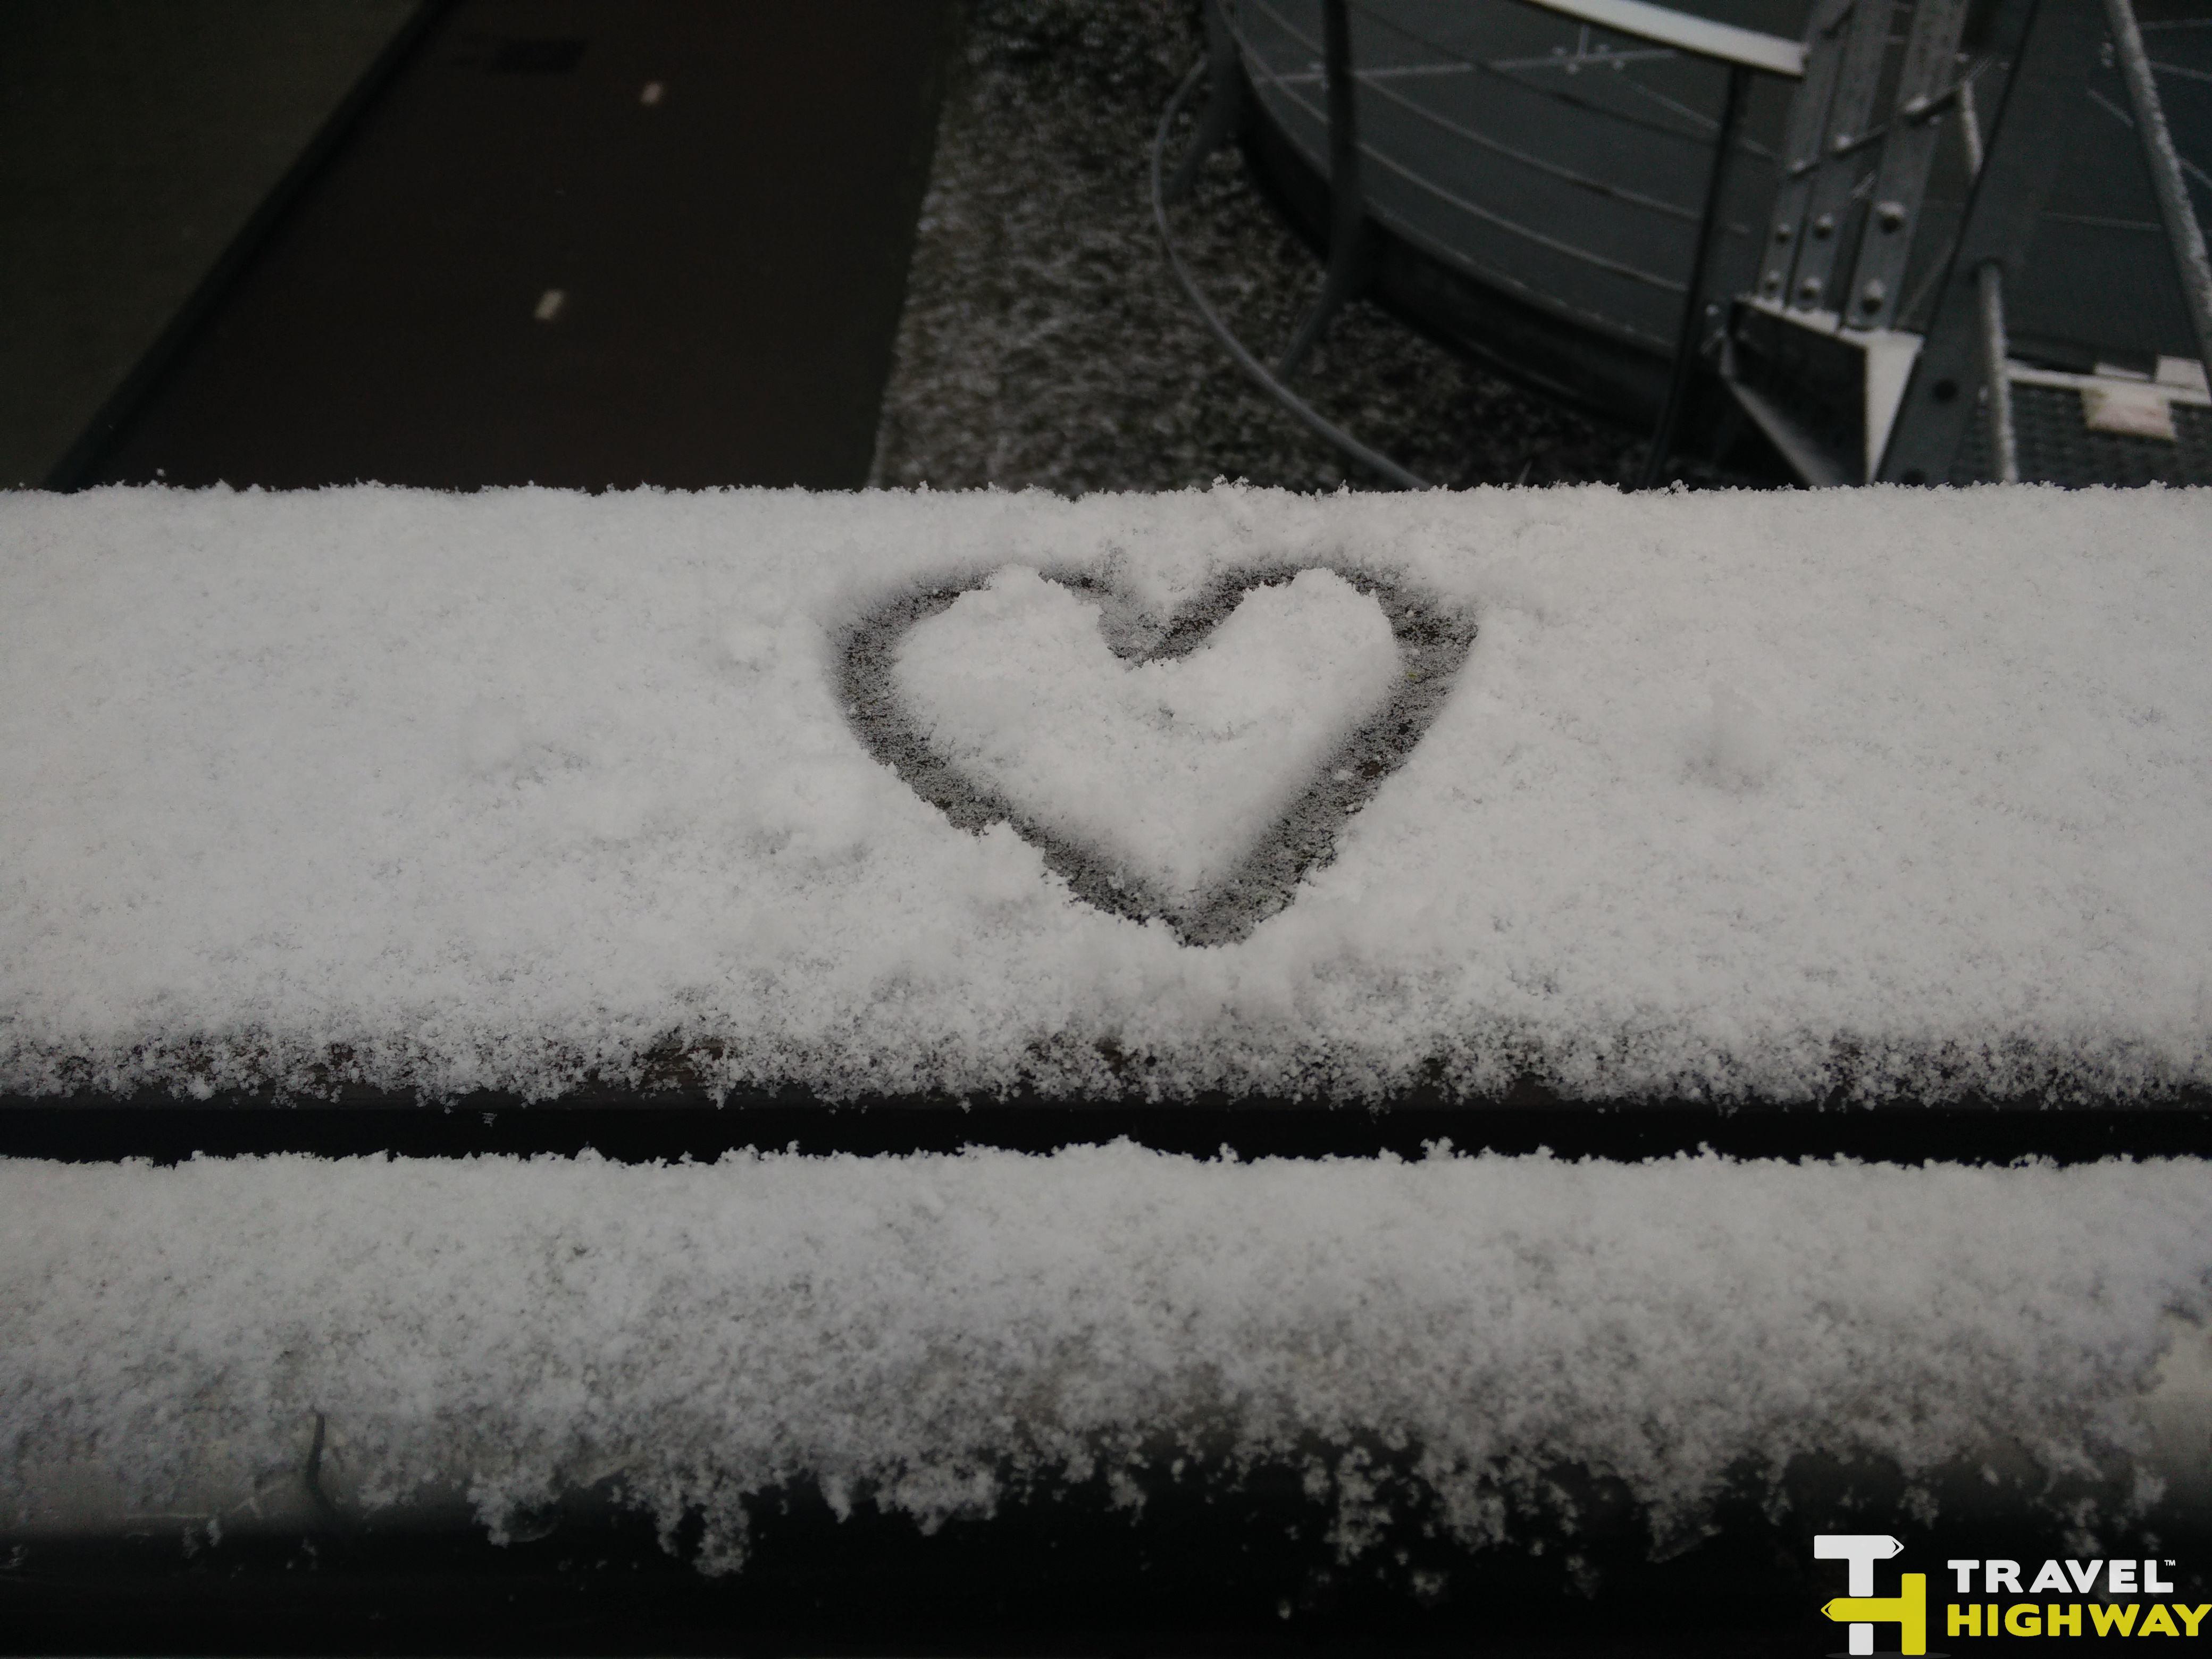 Amsterdam in winter snow